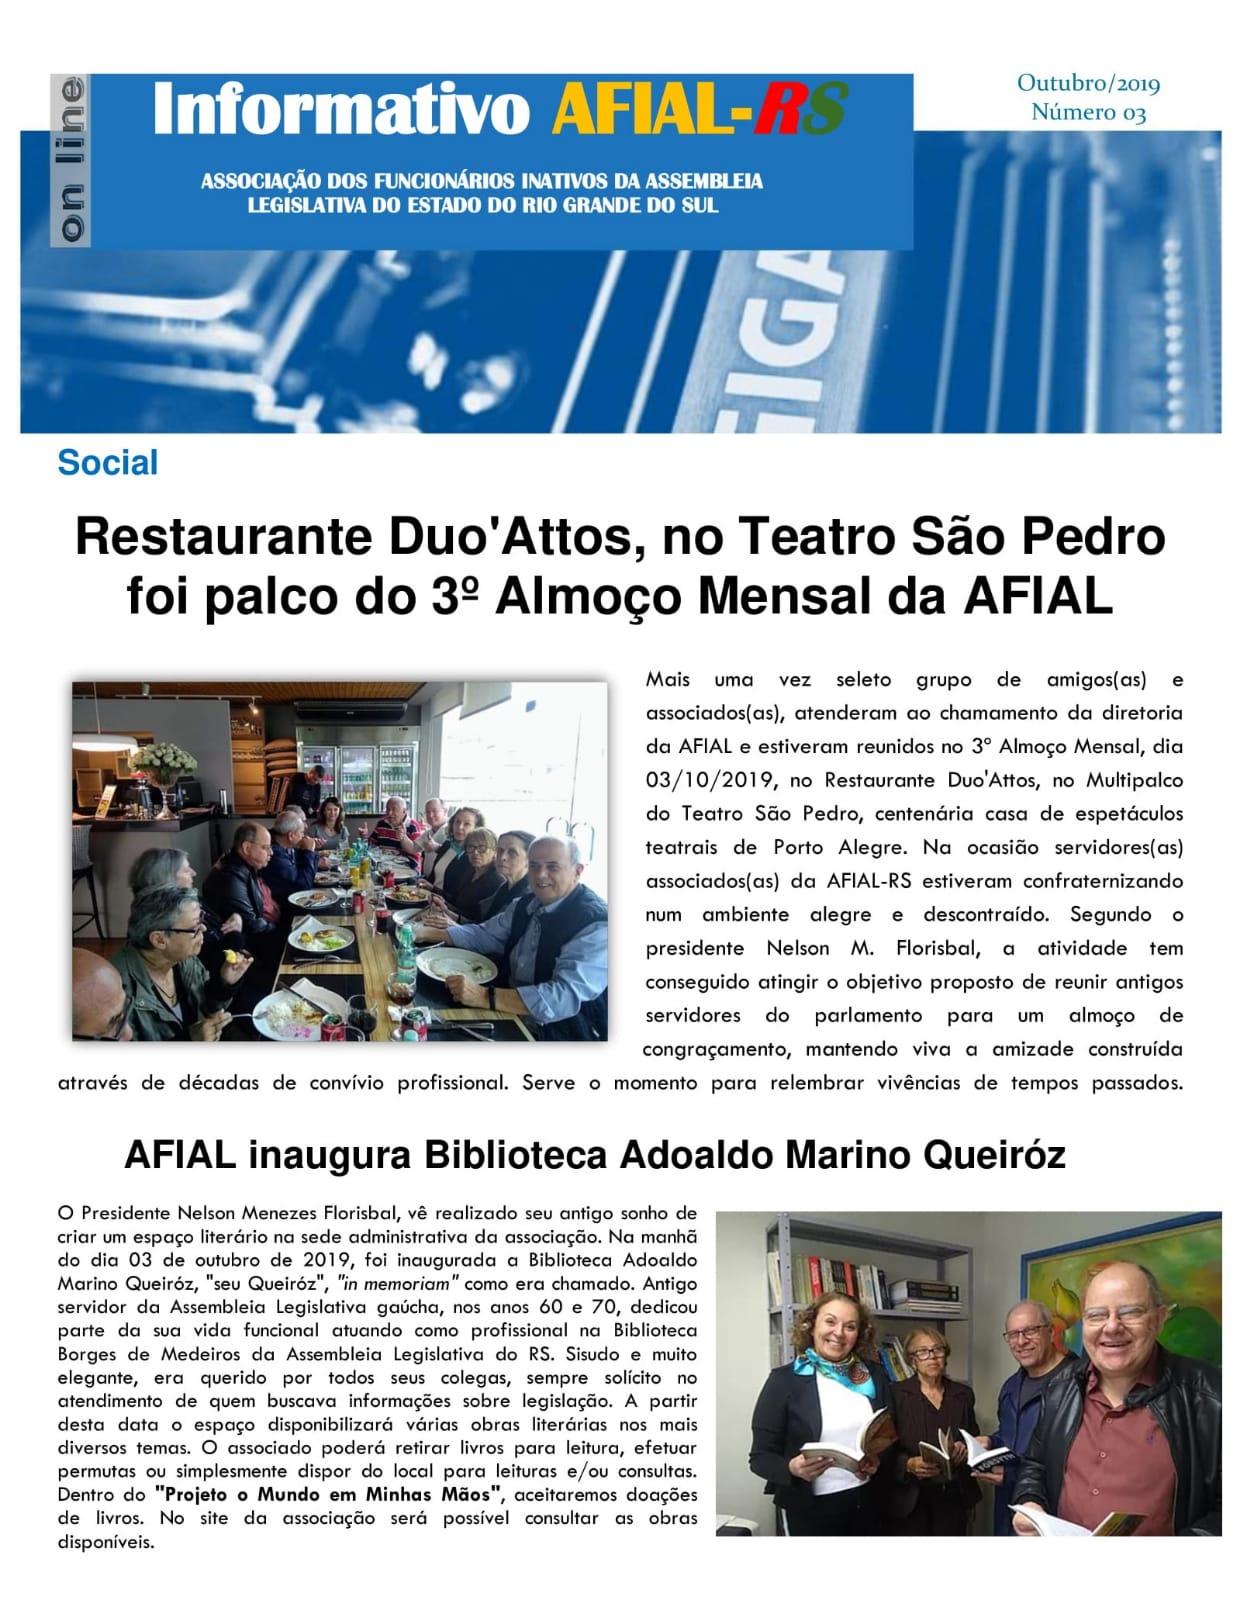 Informativo AFIAL